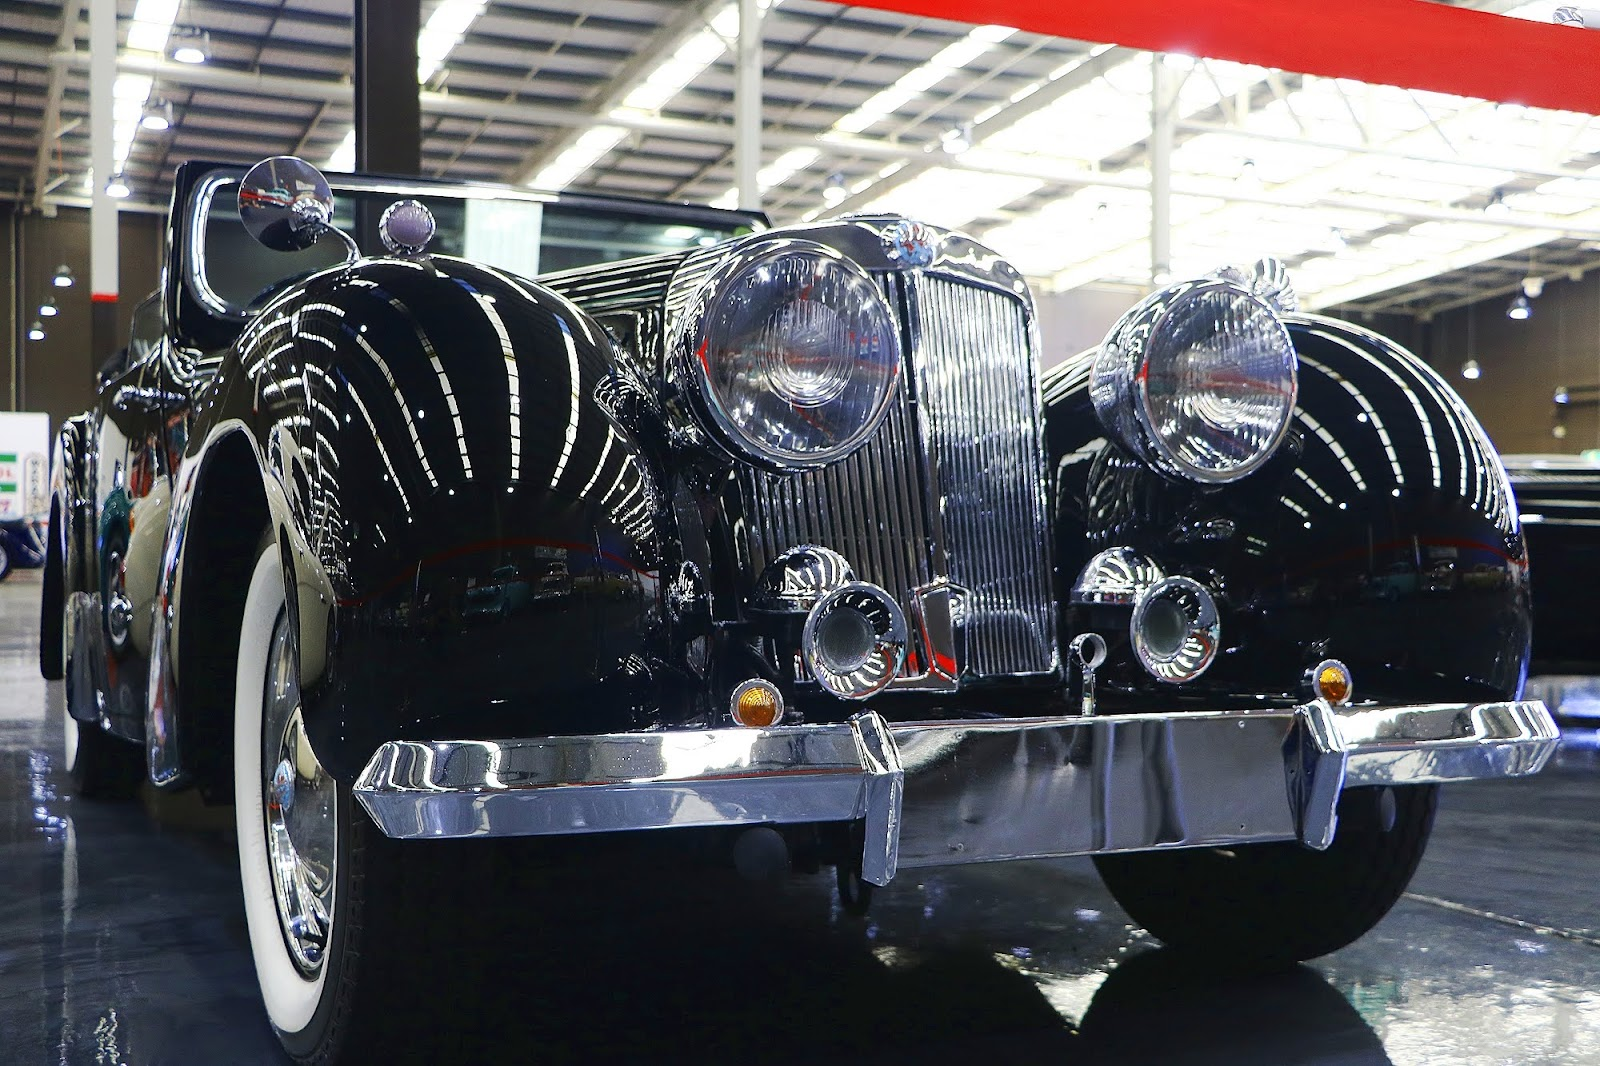 1948 Triumph Roadster 2000 (05).jpg